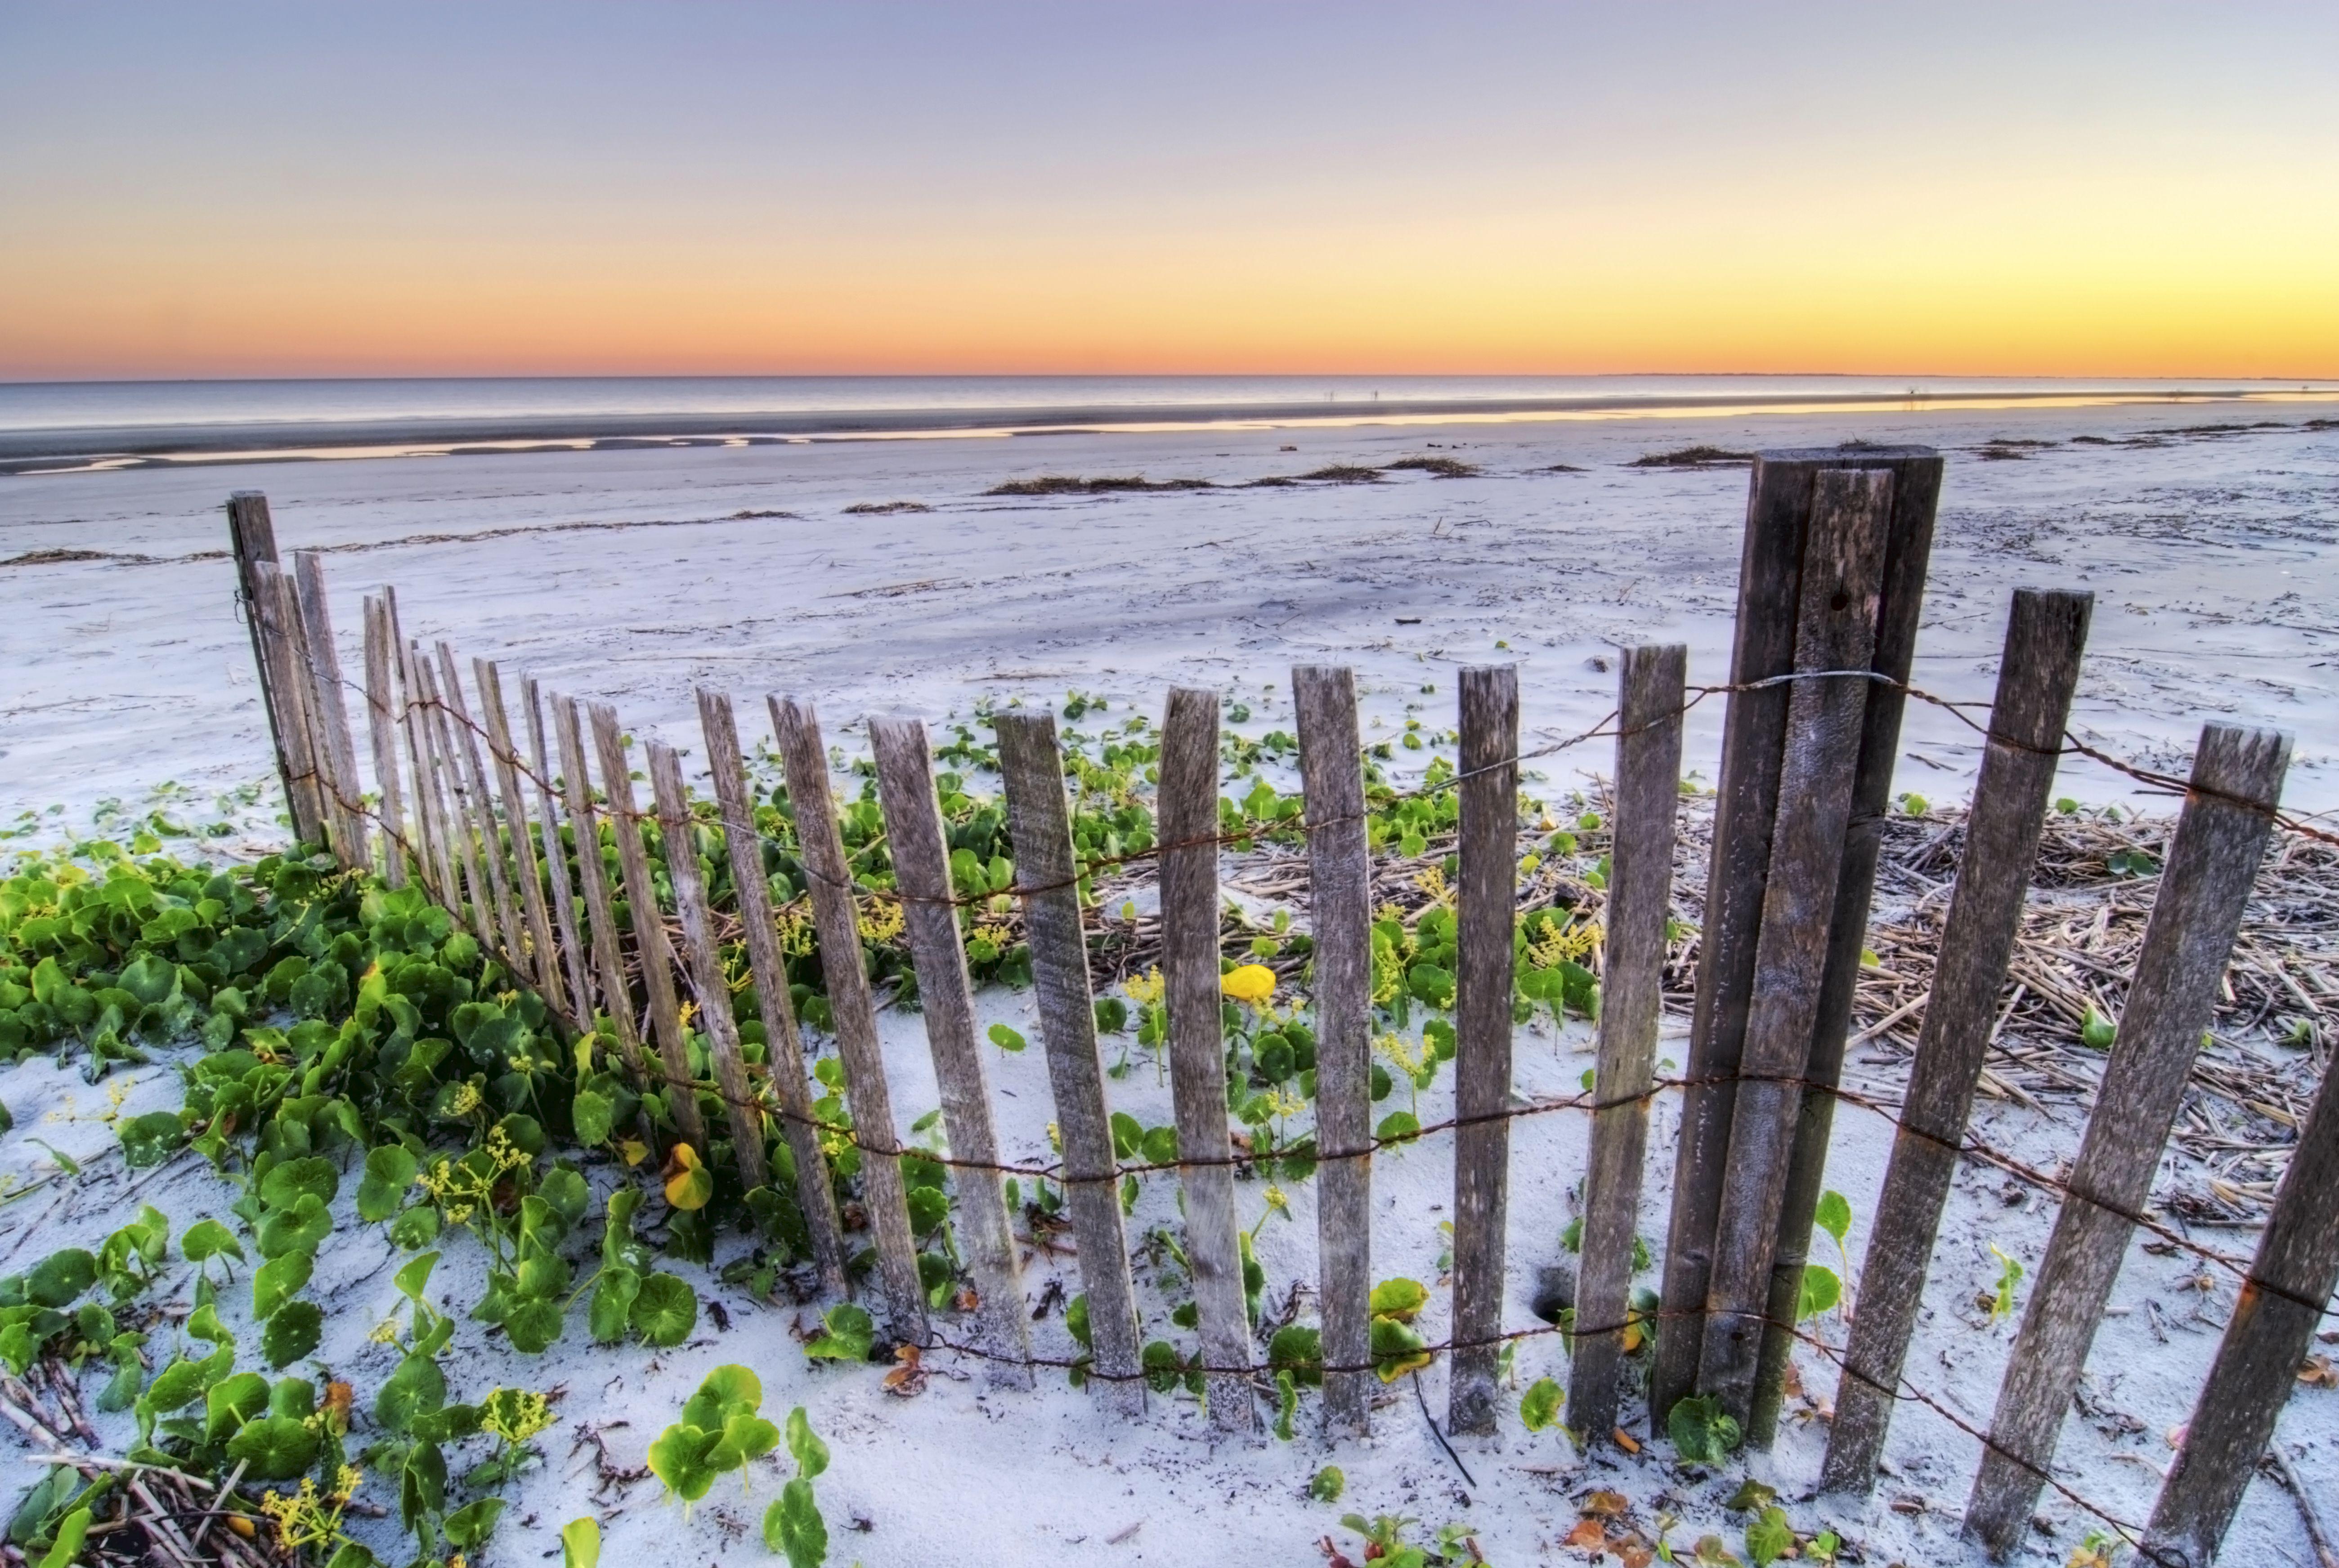 beach fence at sunset on Hilton Head Island, South Carolina.